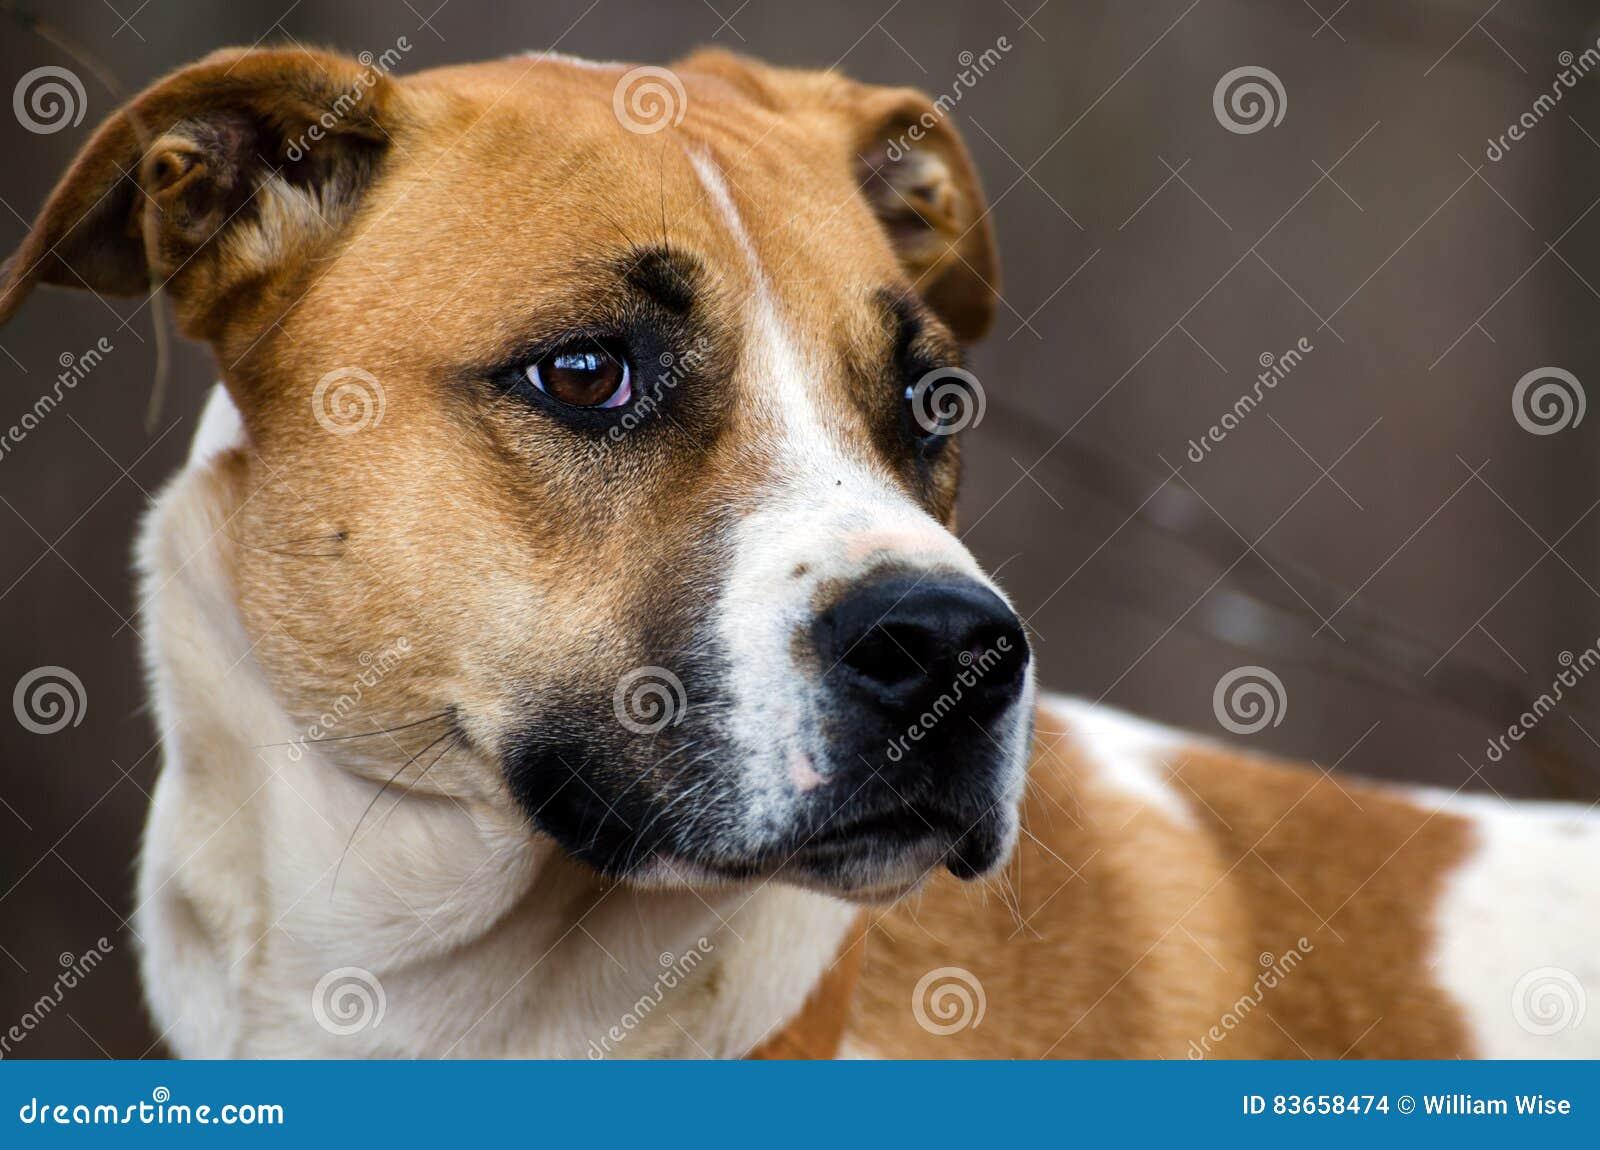 Beagle Mixed Breed Hound Dog Stock Photo | CartoonDealer ...